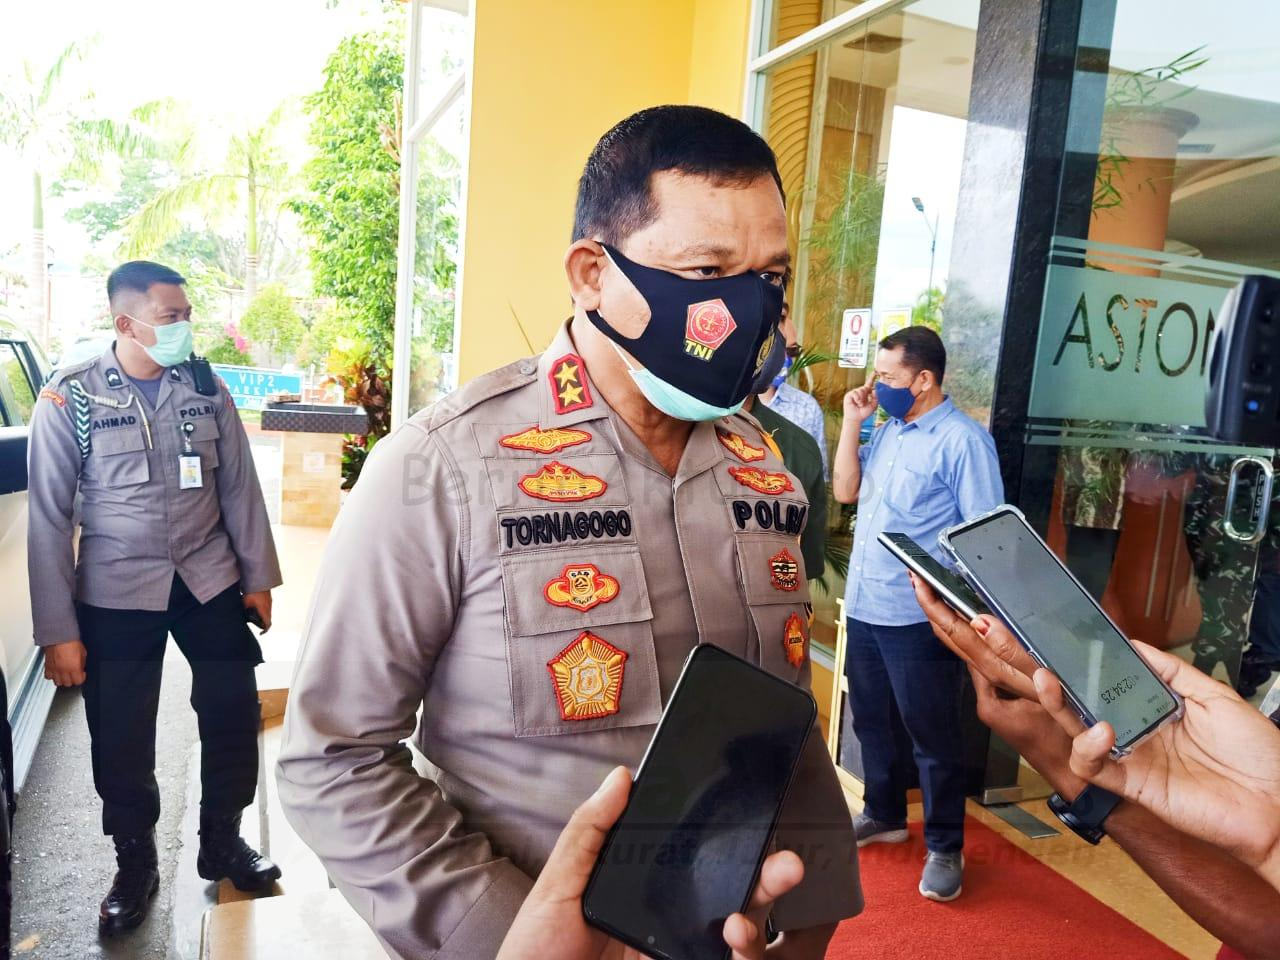 Kapolda PB: Warga Yang Tidak Pakai Masker Dapat Sanksi Baca Pancasila 18 IMG 20200926 WA0032